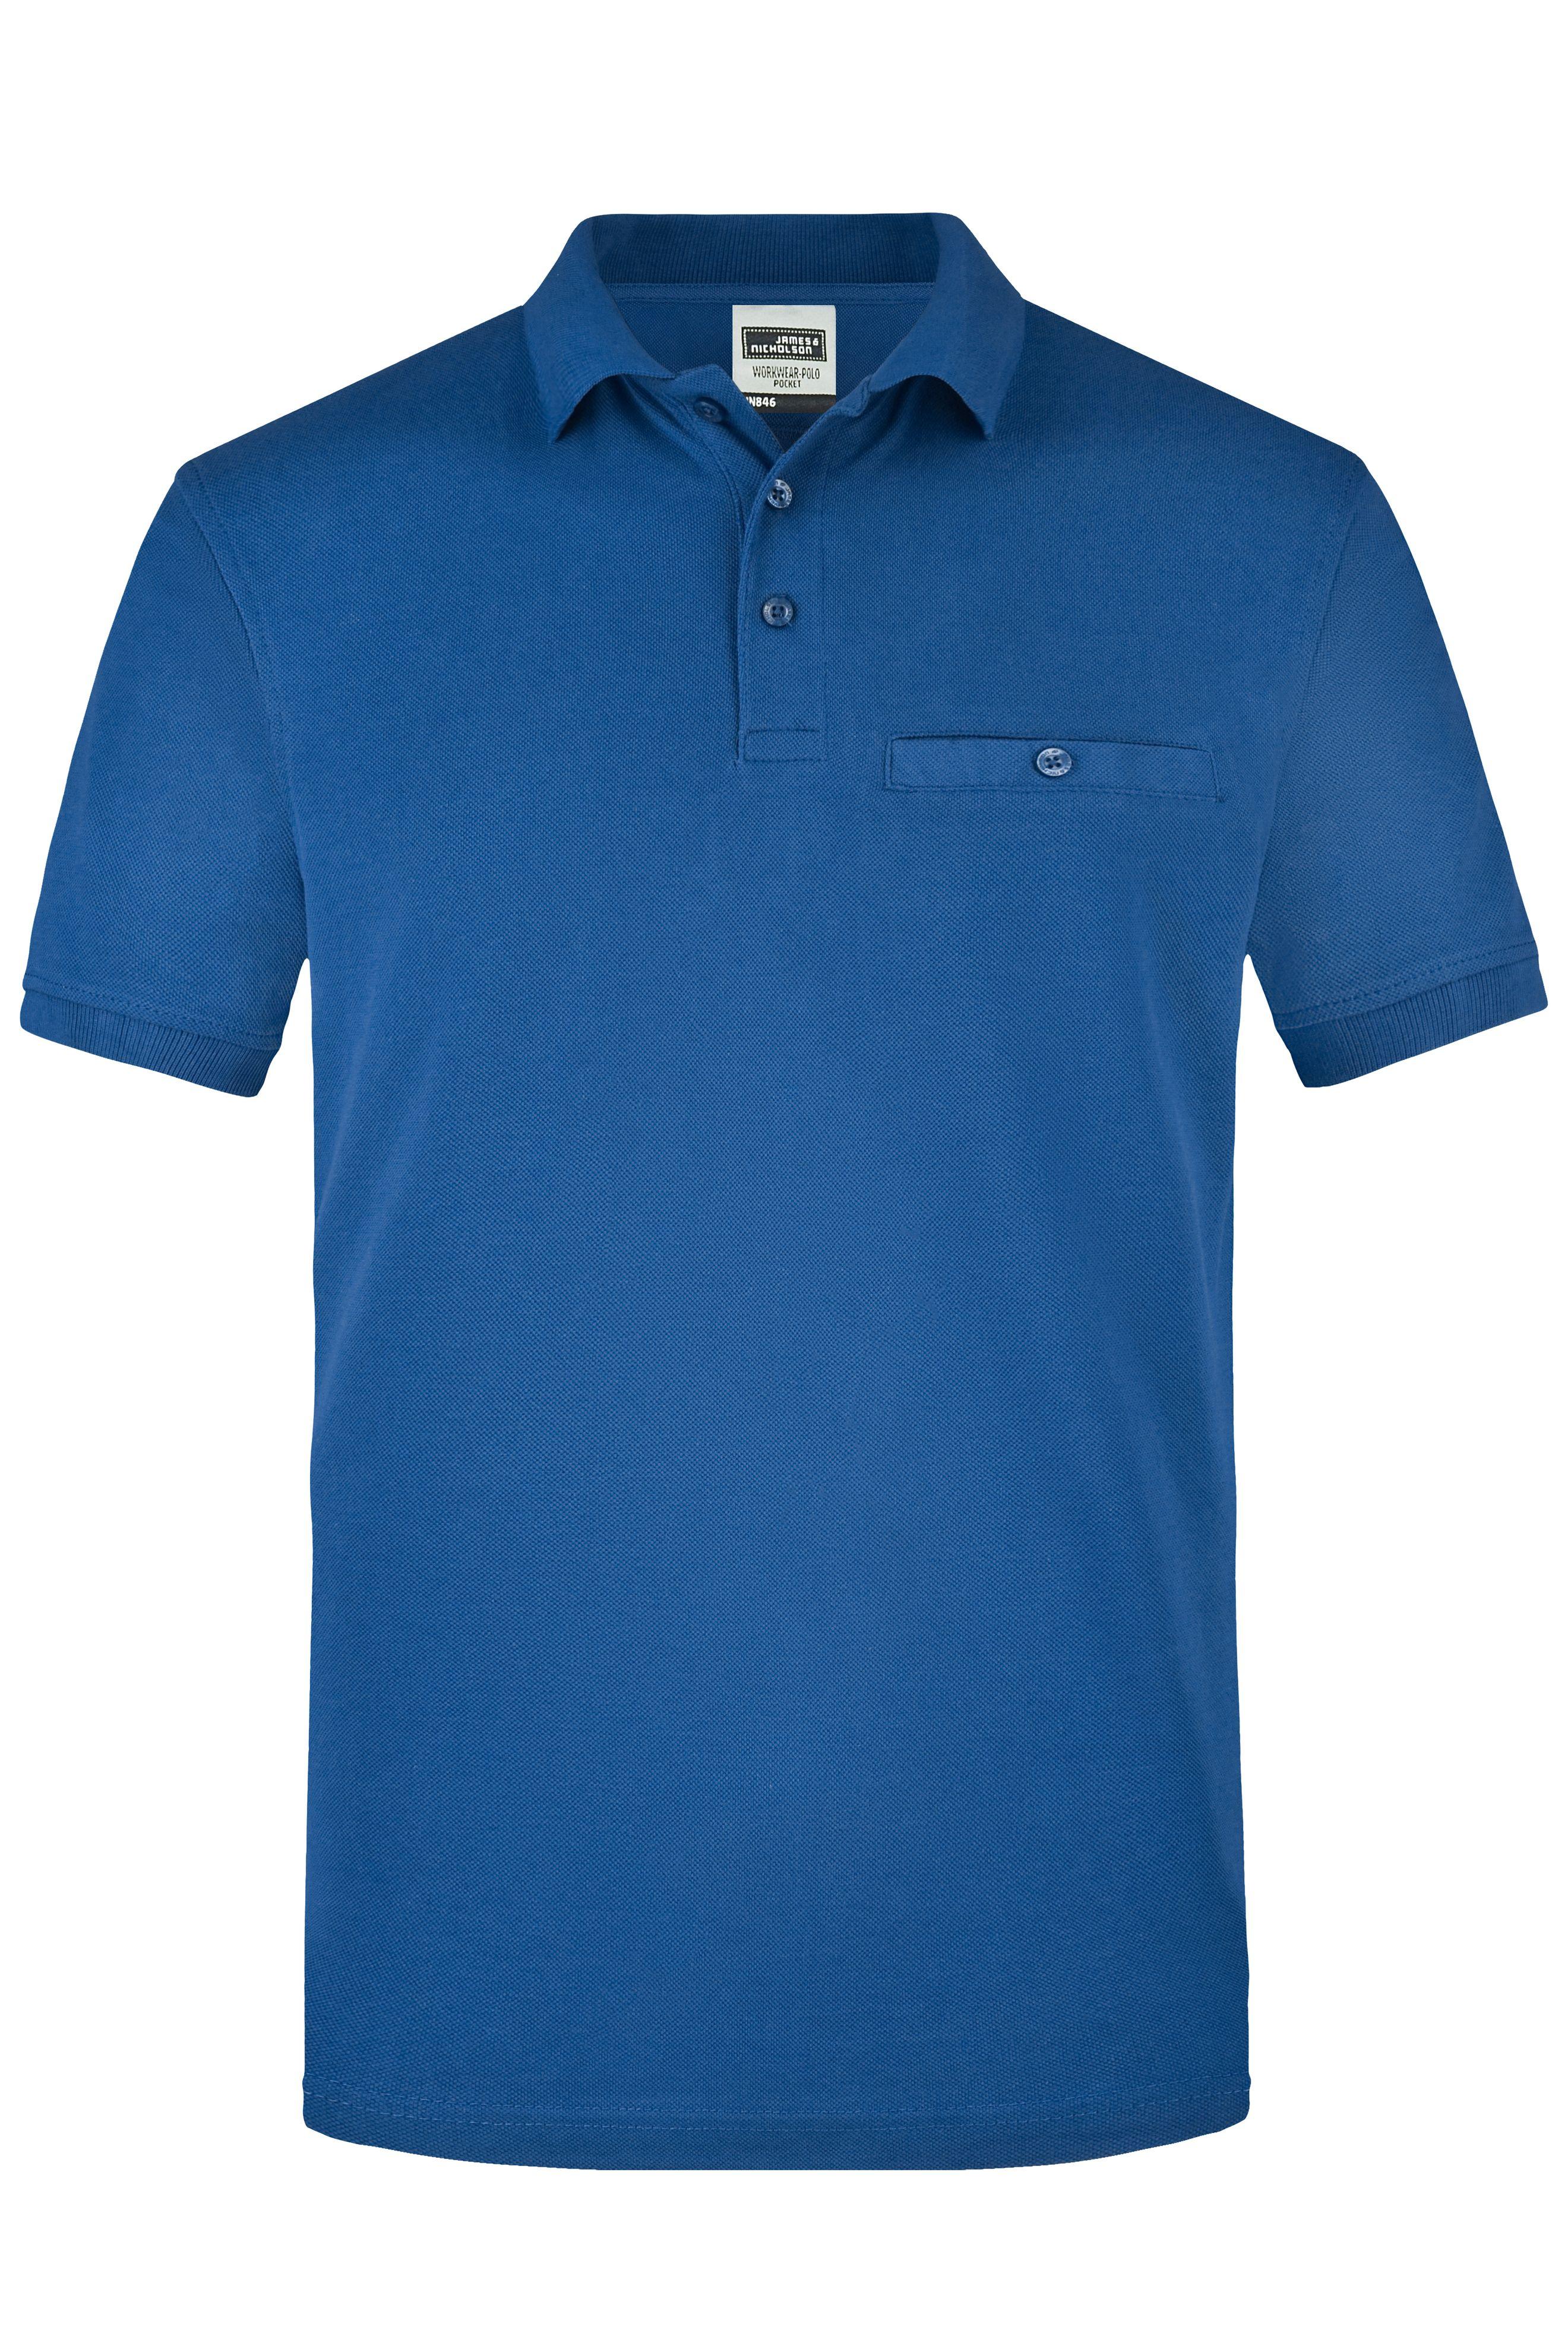 Poloshirt Workwear Pocket Herren